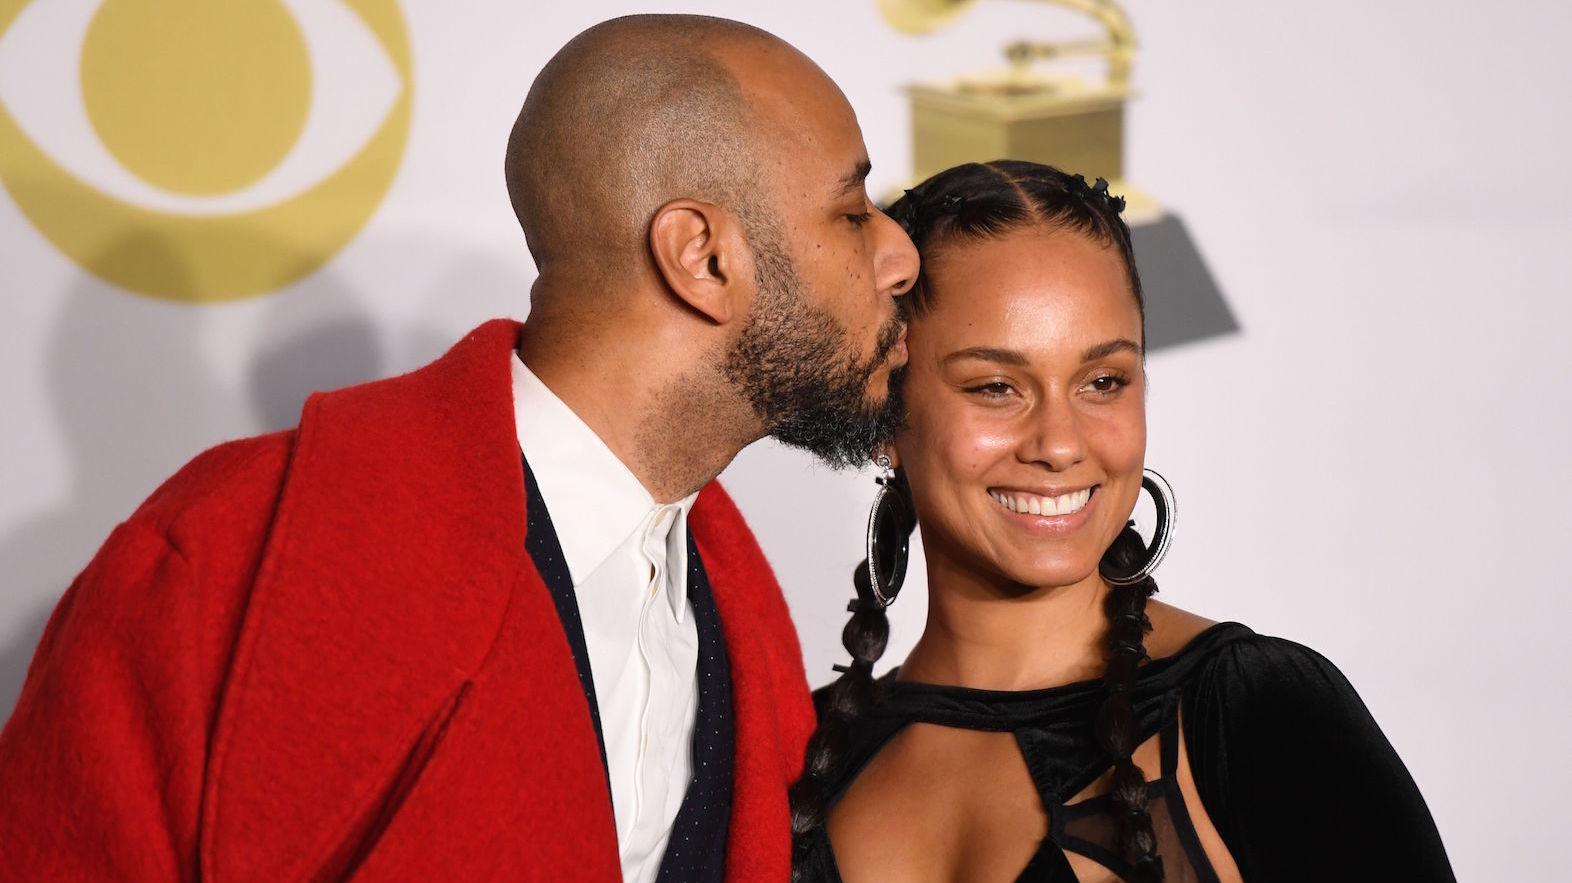 From Teens to Walking Down the Aisle! Meet Alicia Keys' Husband Swizz Beatz